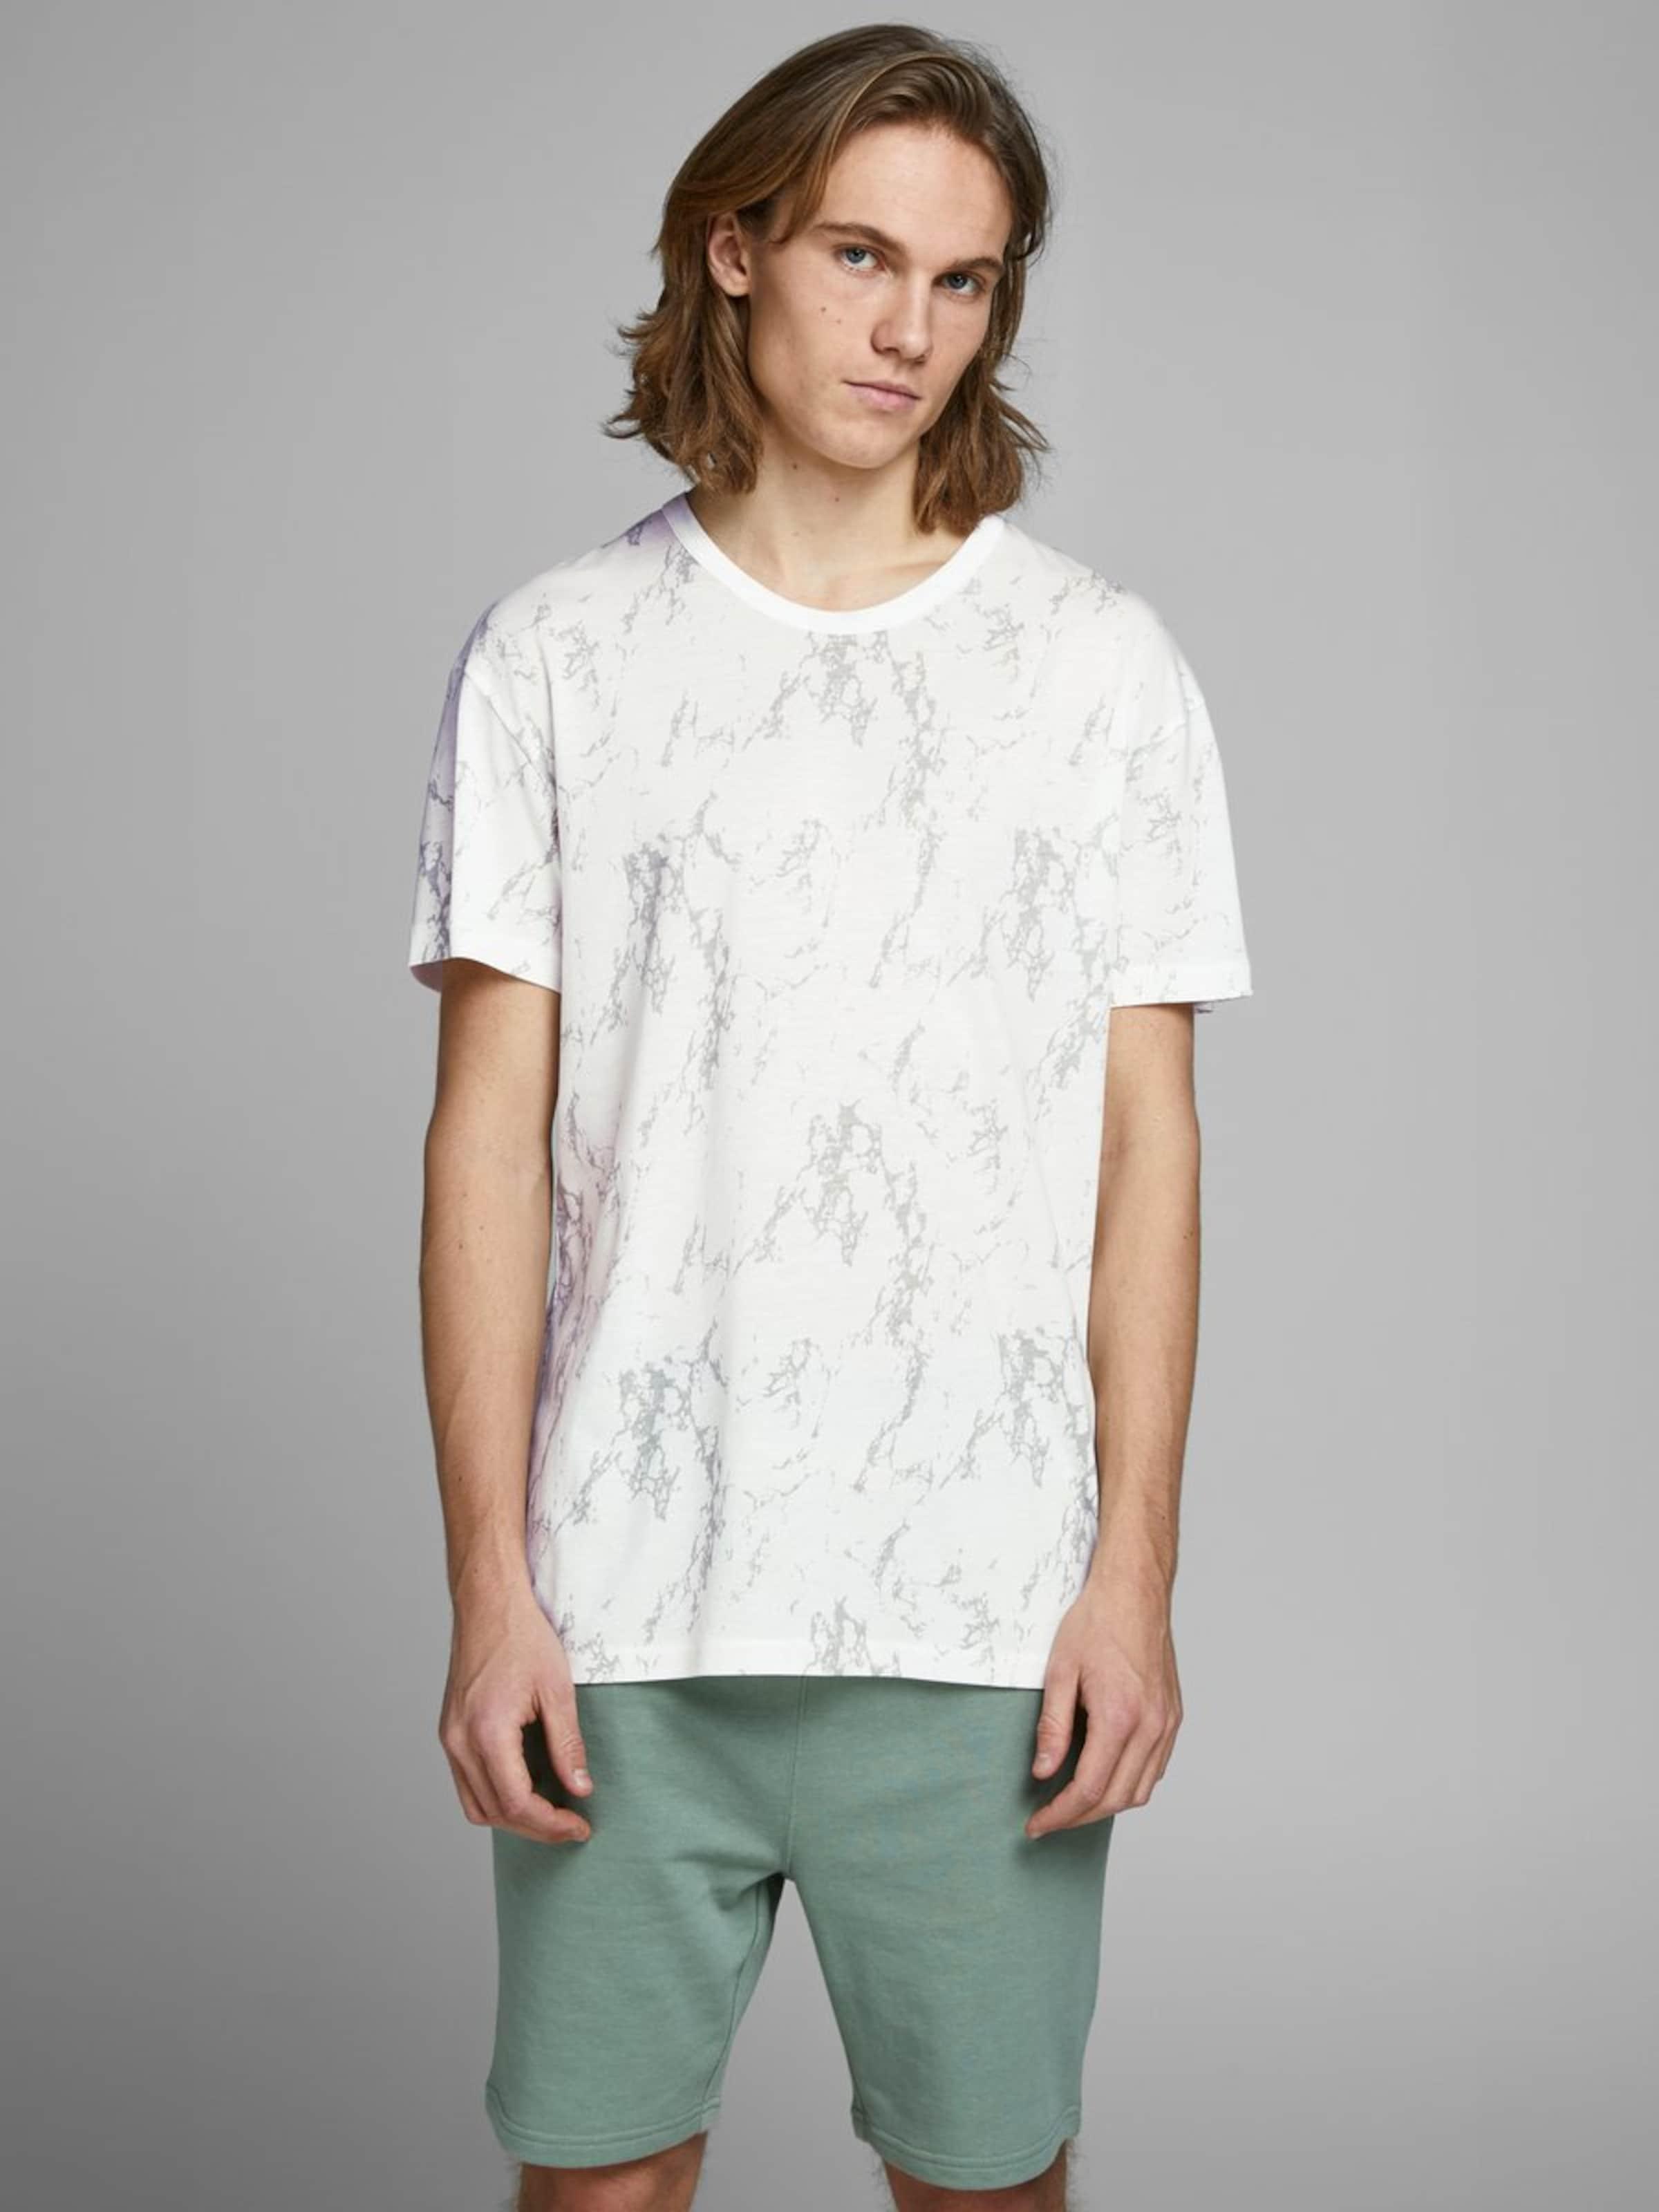 Jones In Jackamp; HellbeigeWeiß T shirt K1cTJlF3